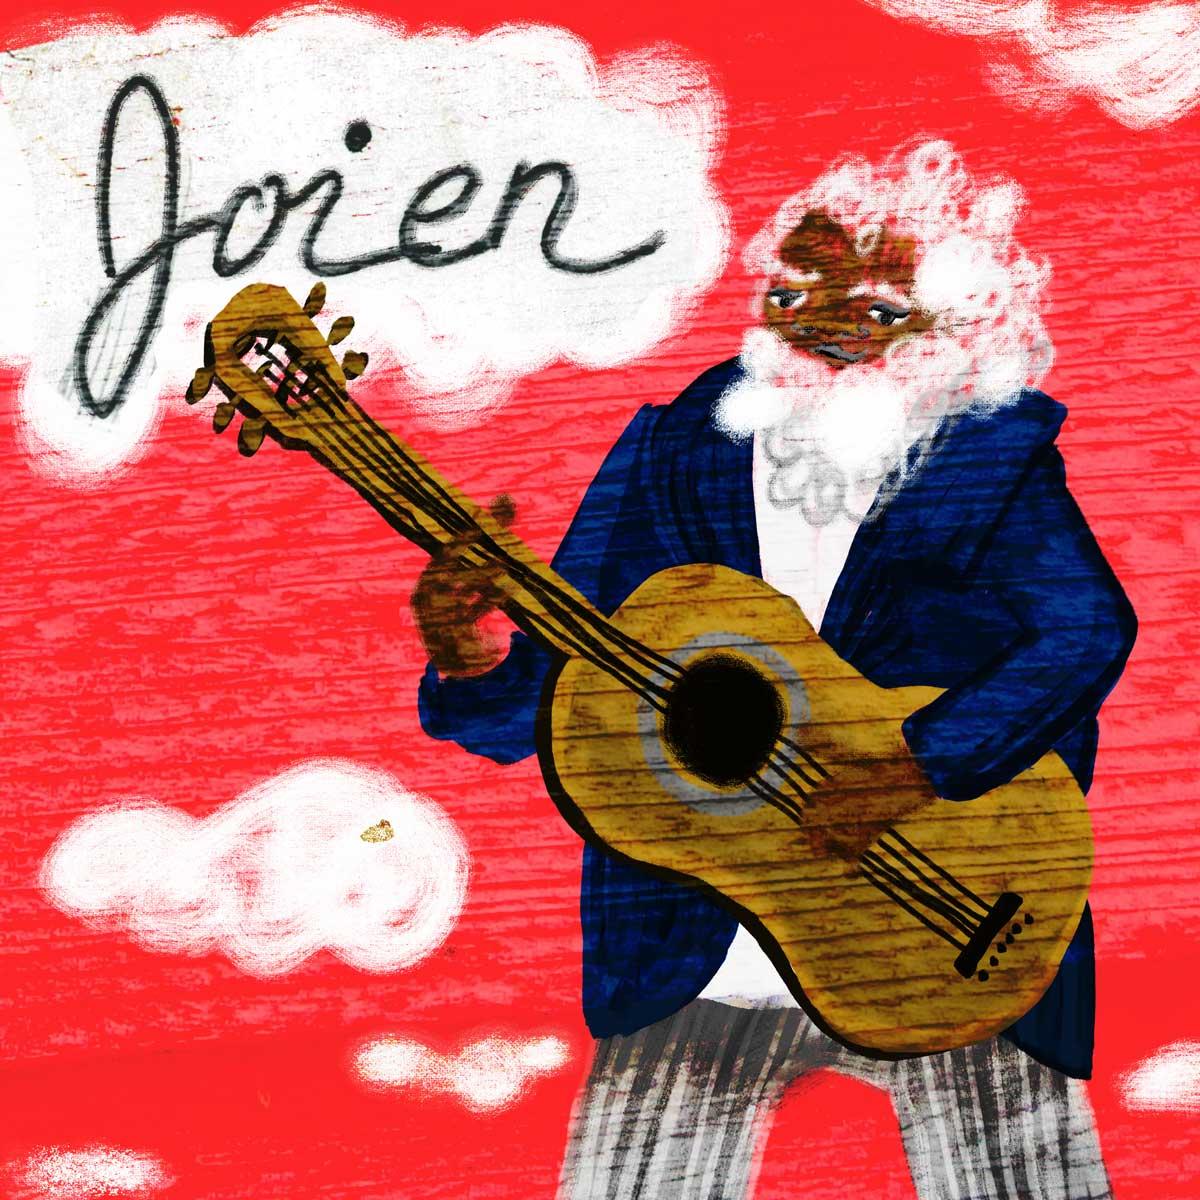 Joien - Album Cover (Digital Illustration)